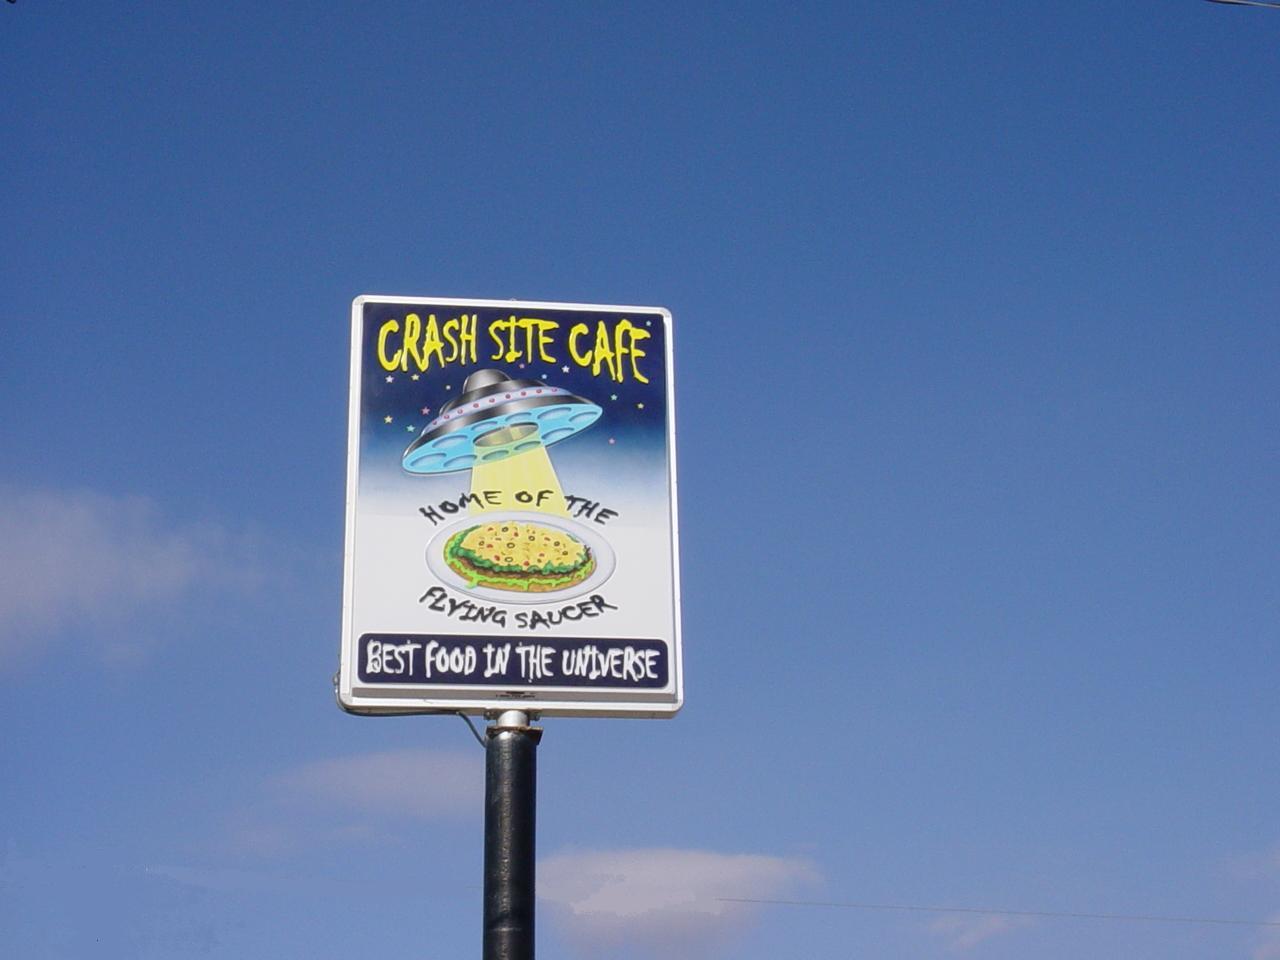 89 Crash Site Cafe Roswell.jpg